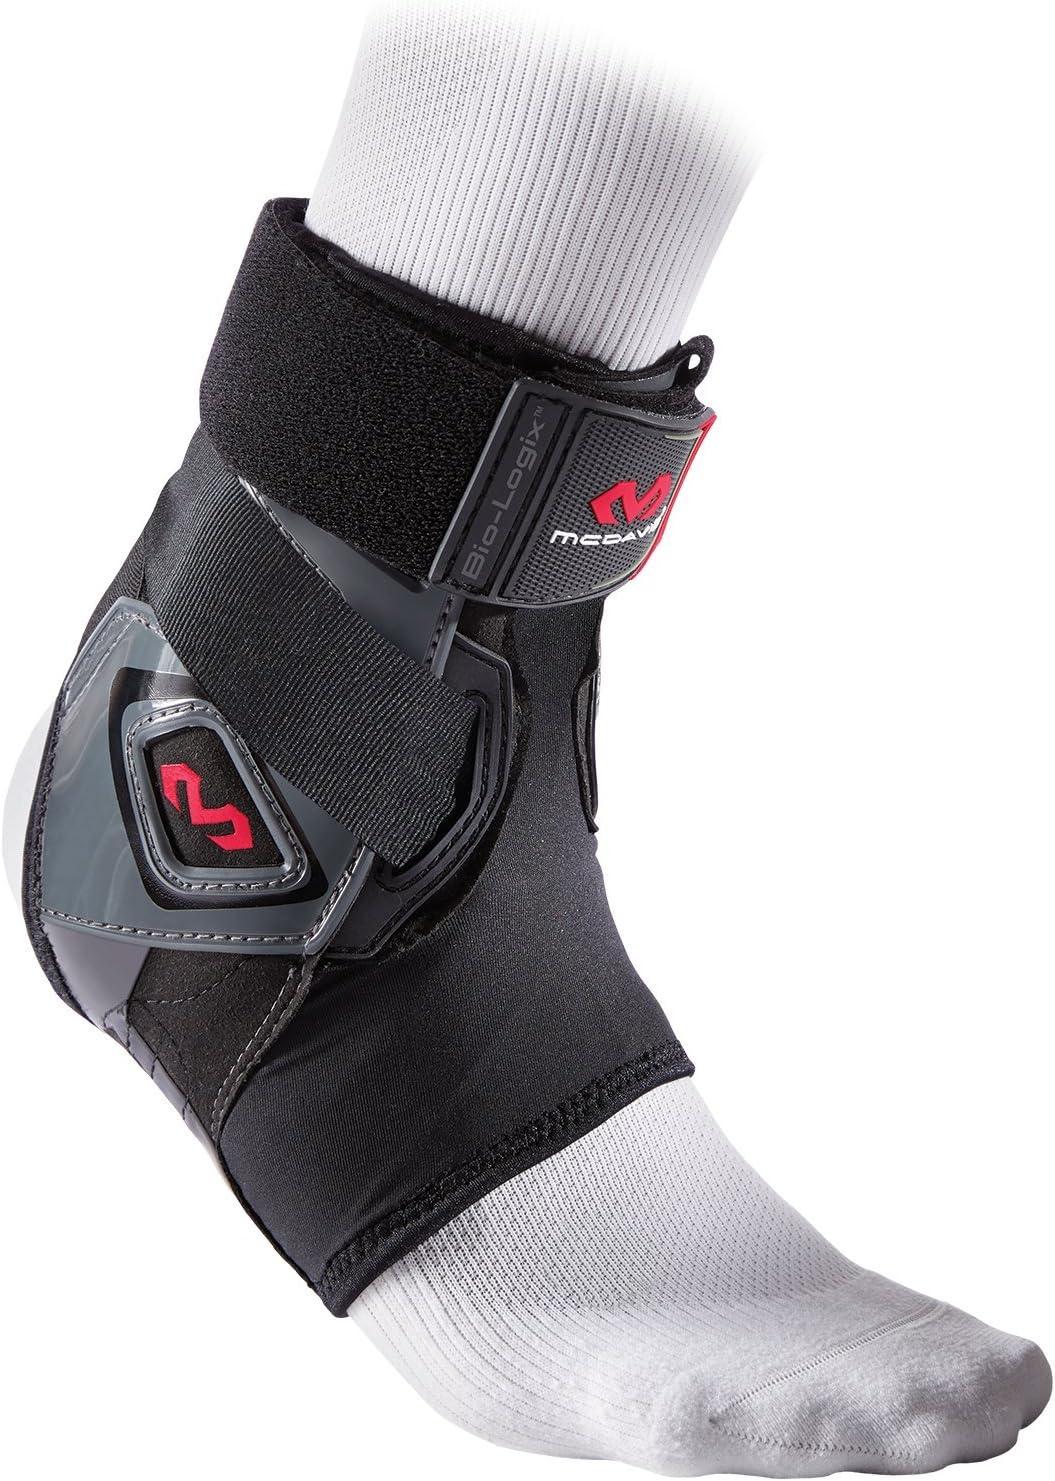 best ankle brace for sprain 2021